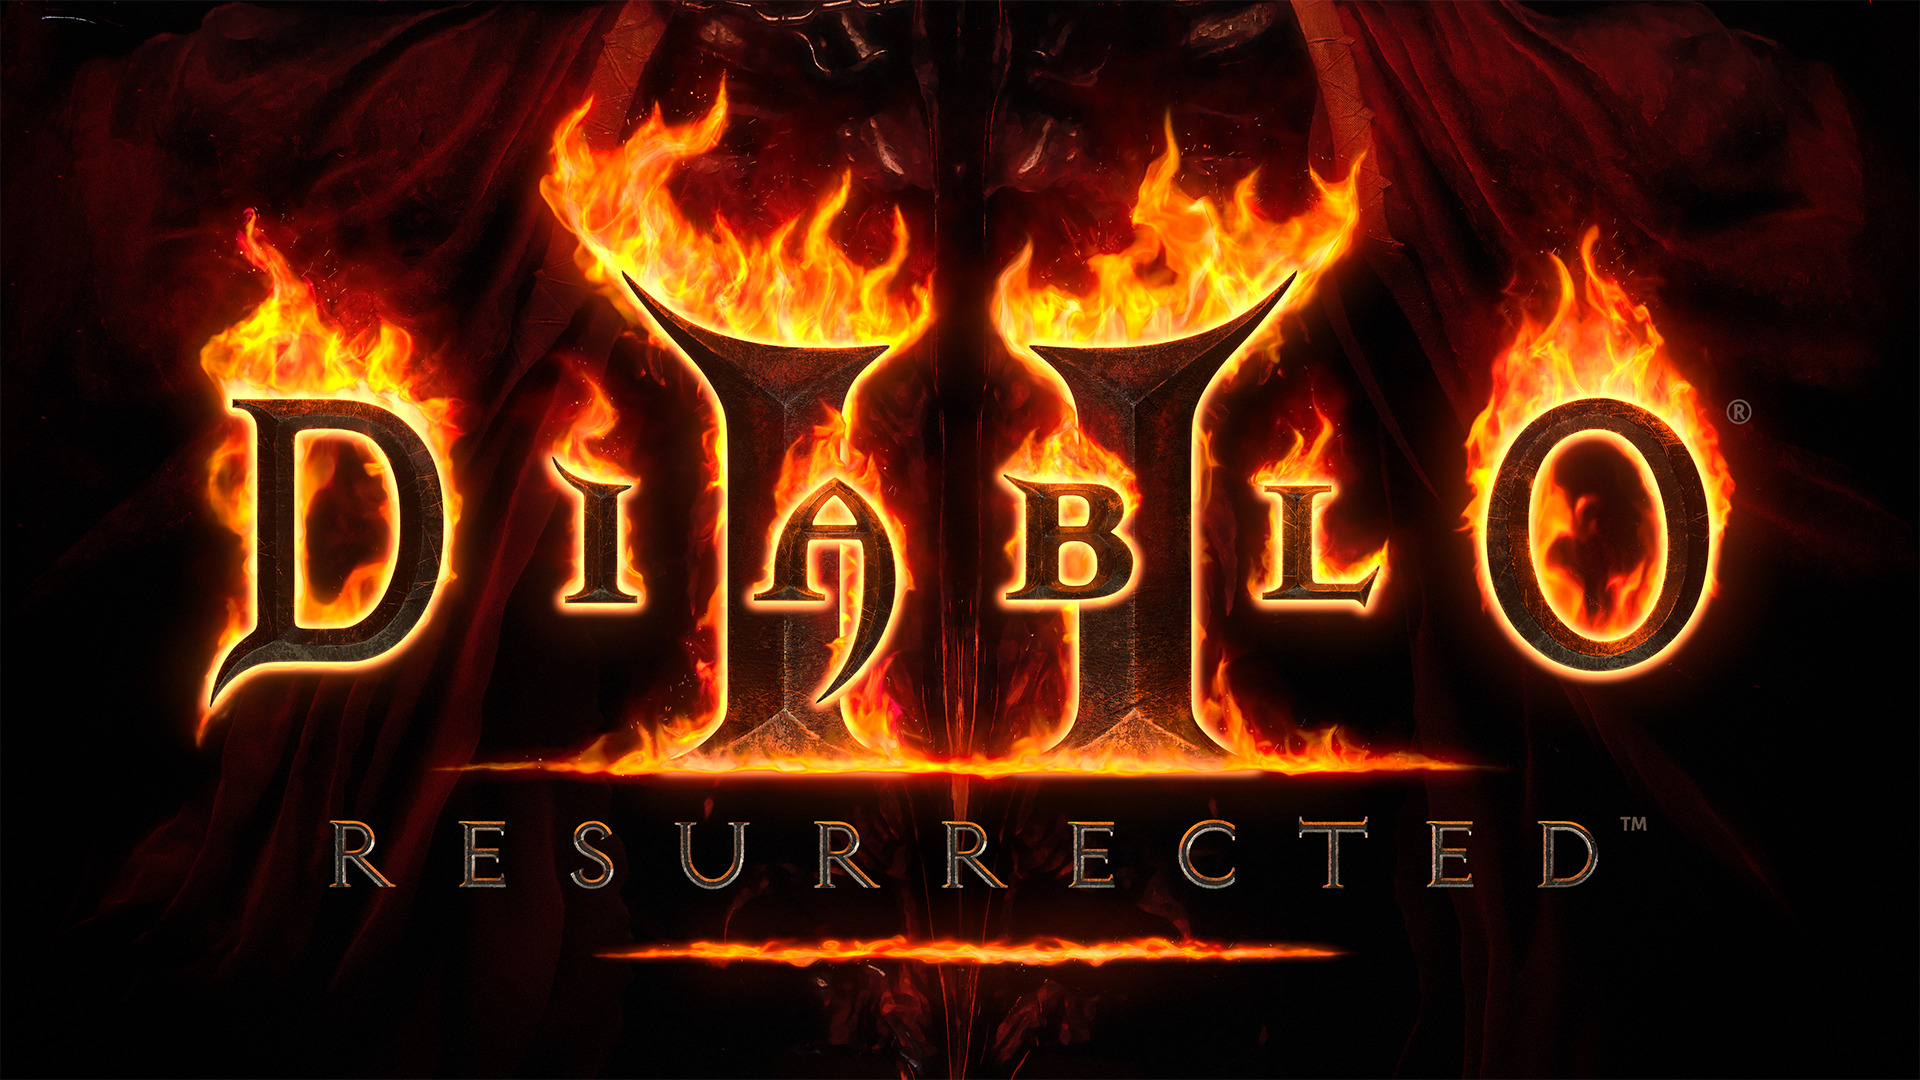 Gaming, Spiele, Games, Blizzard, Diablo, Blizzard Entertainment, Diablo 2, Diablo 2: Resurrected, Diablo II: Resurrected